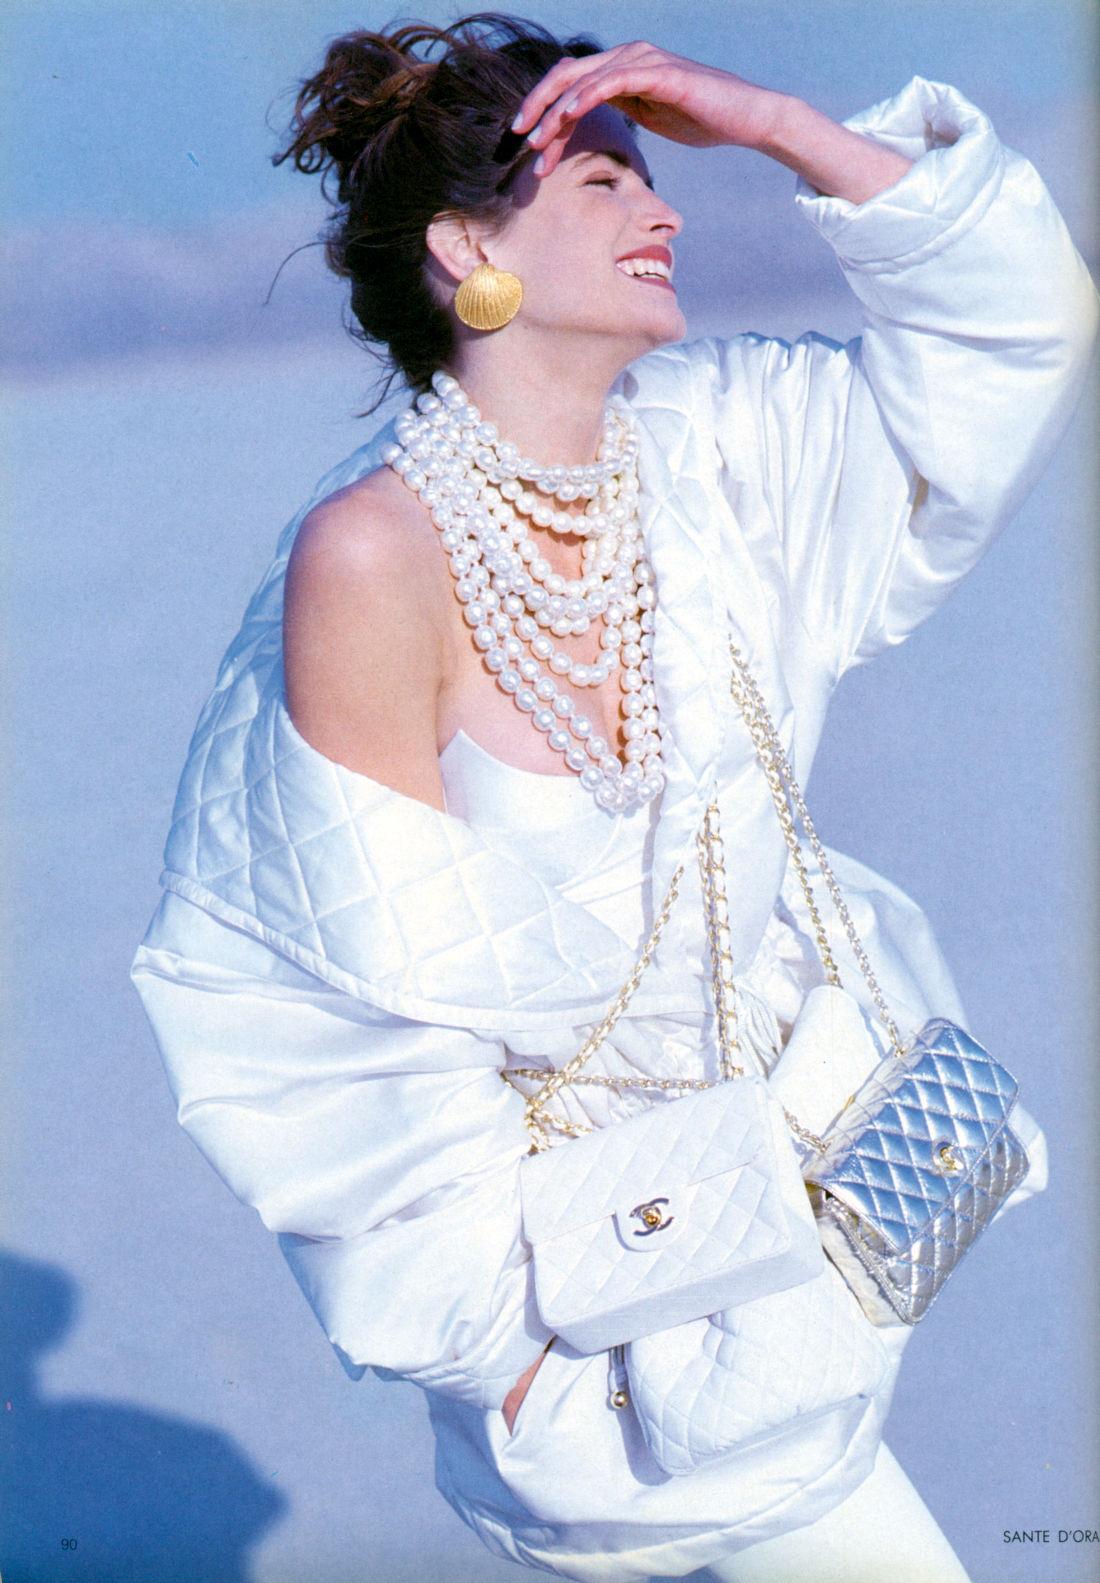 Vogue (UK) July 1990 | Stephanie Seymour 07.jpg